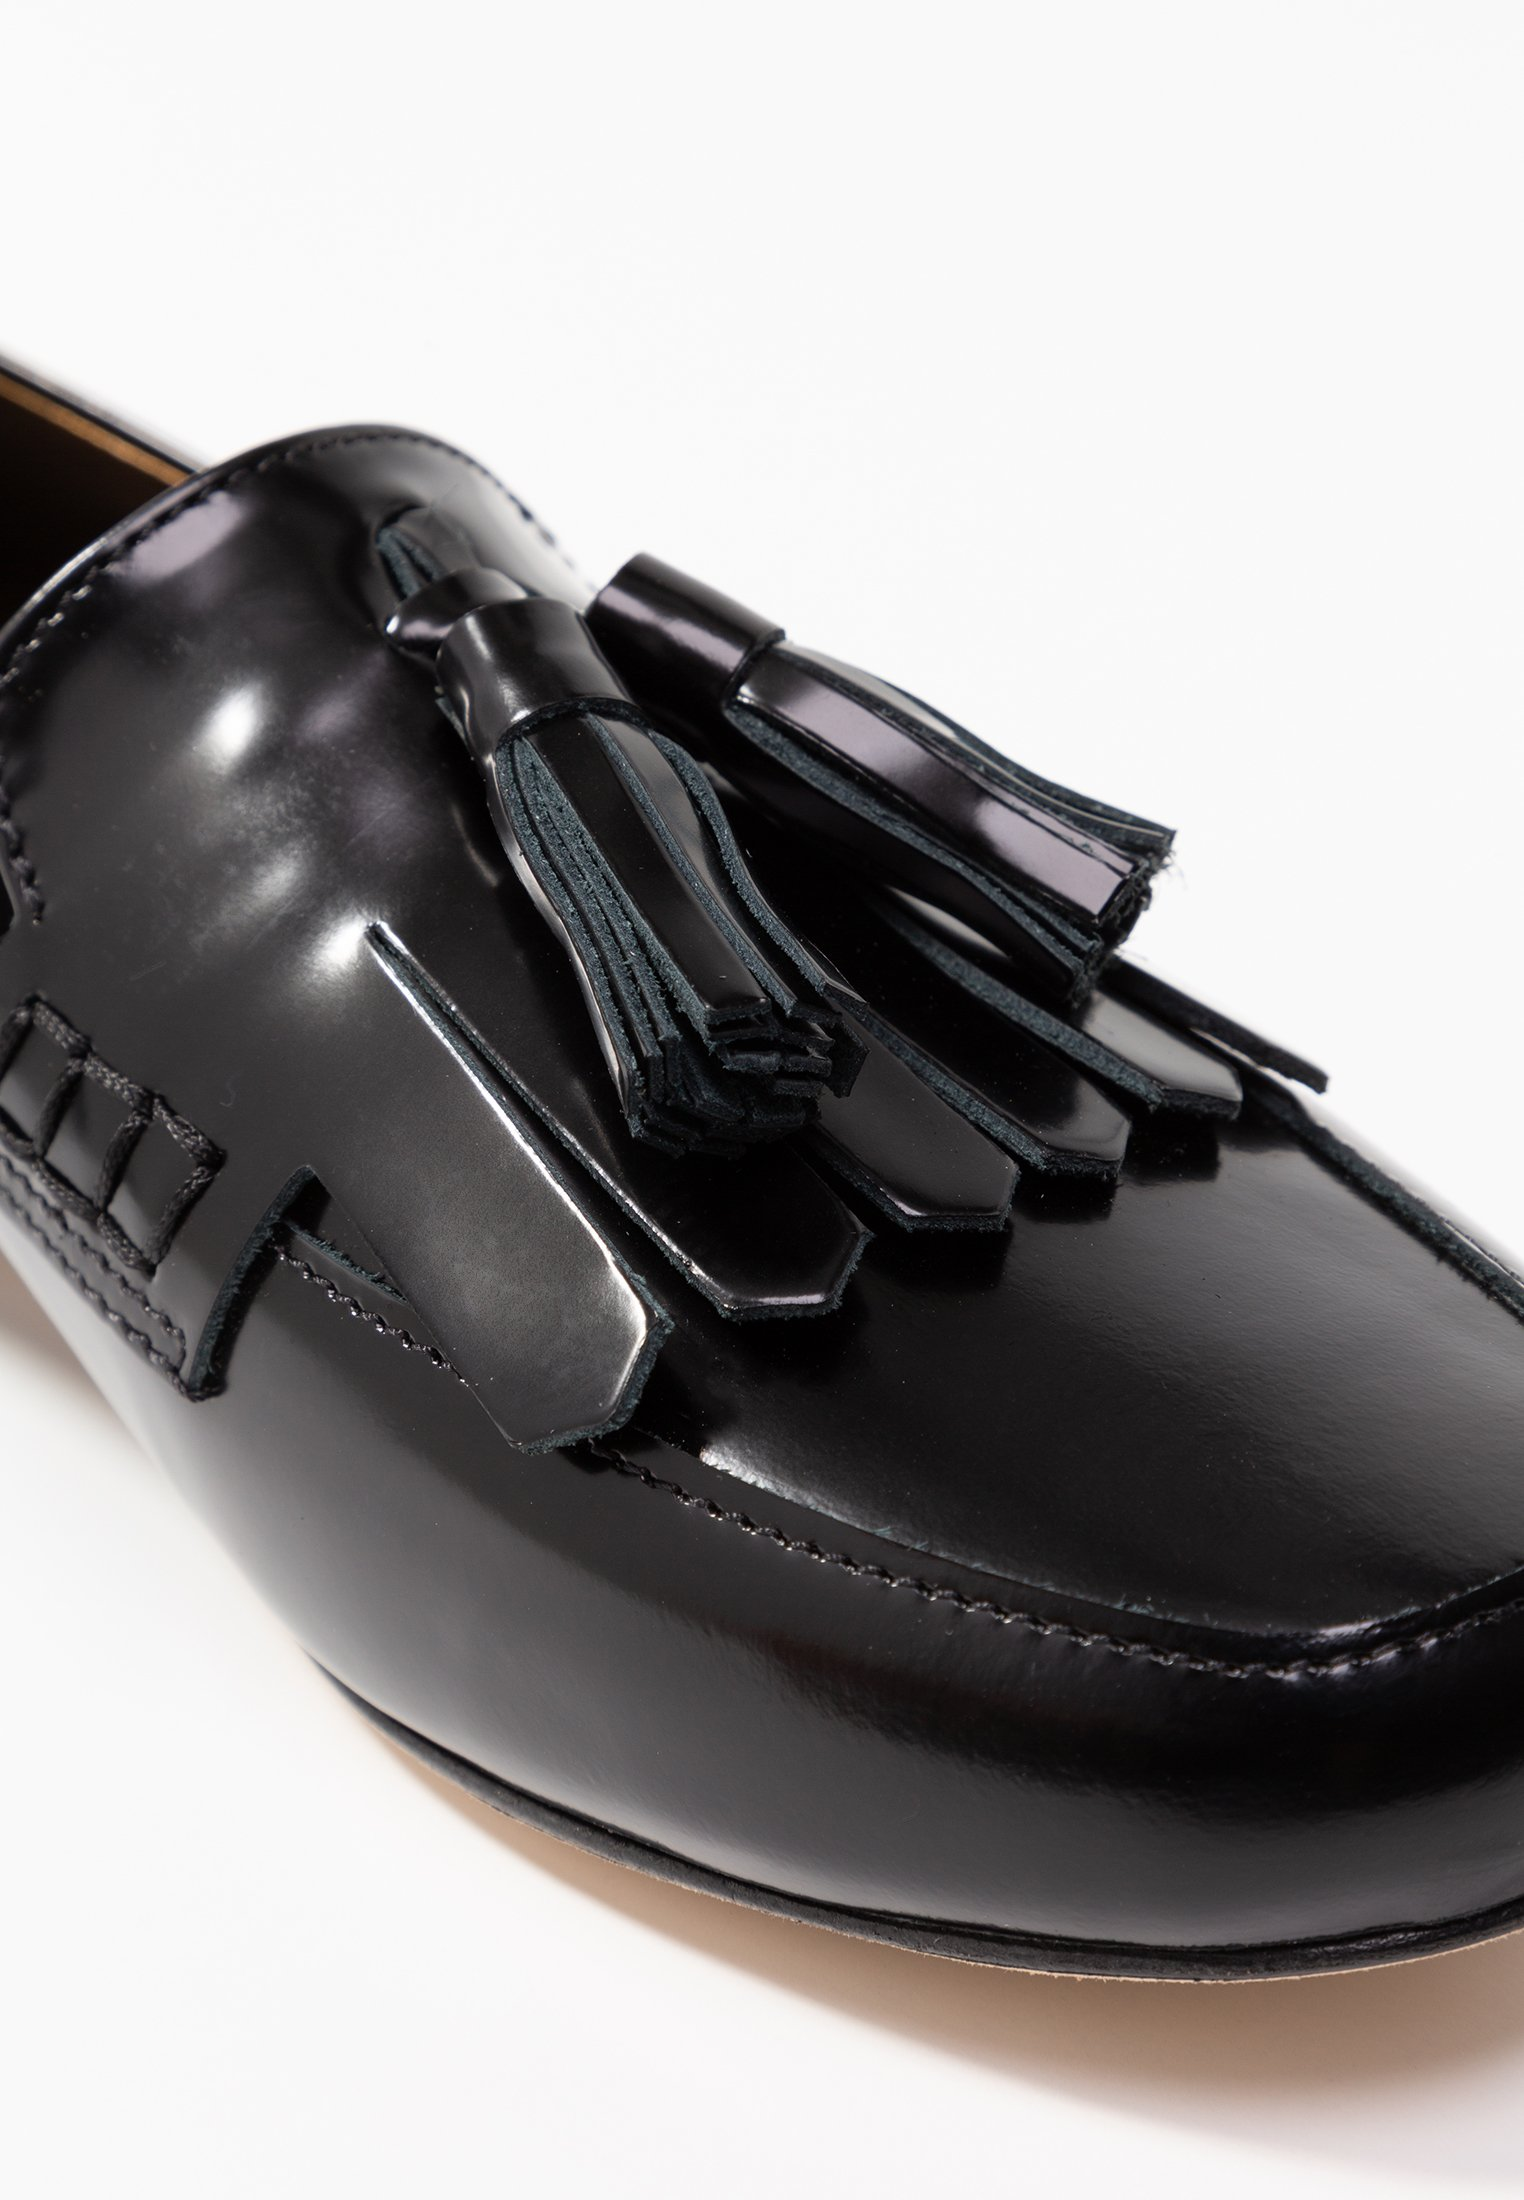 LoaferMocassins LoaferMocassins Filippa Black Leslie K Filippa Leslie K XwPn0O8k